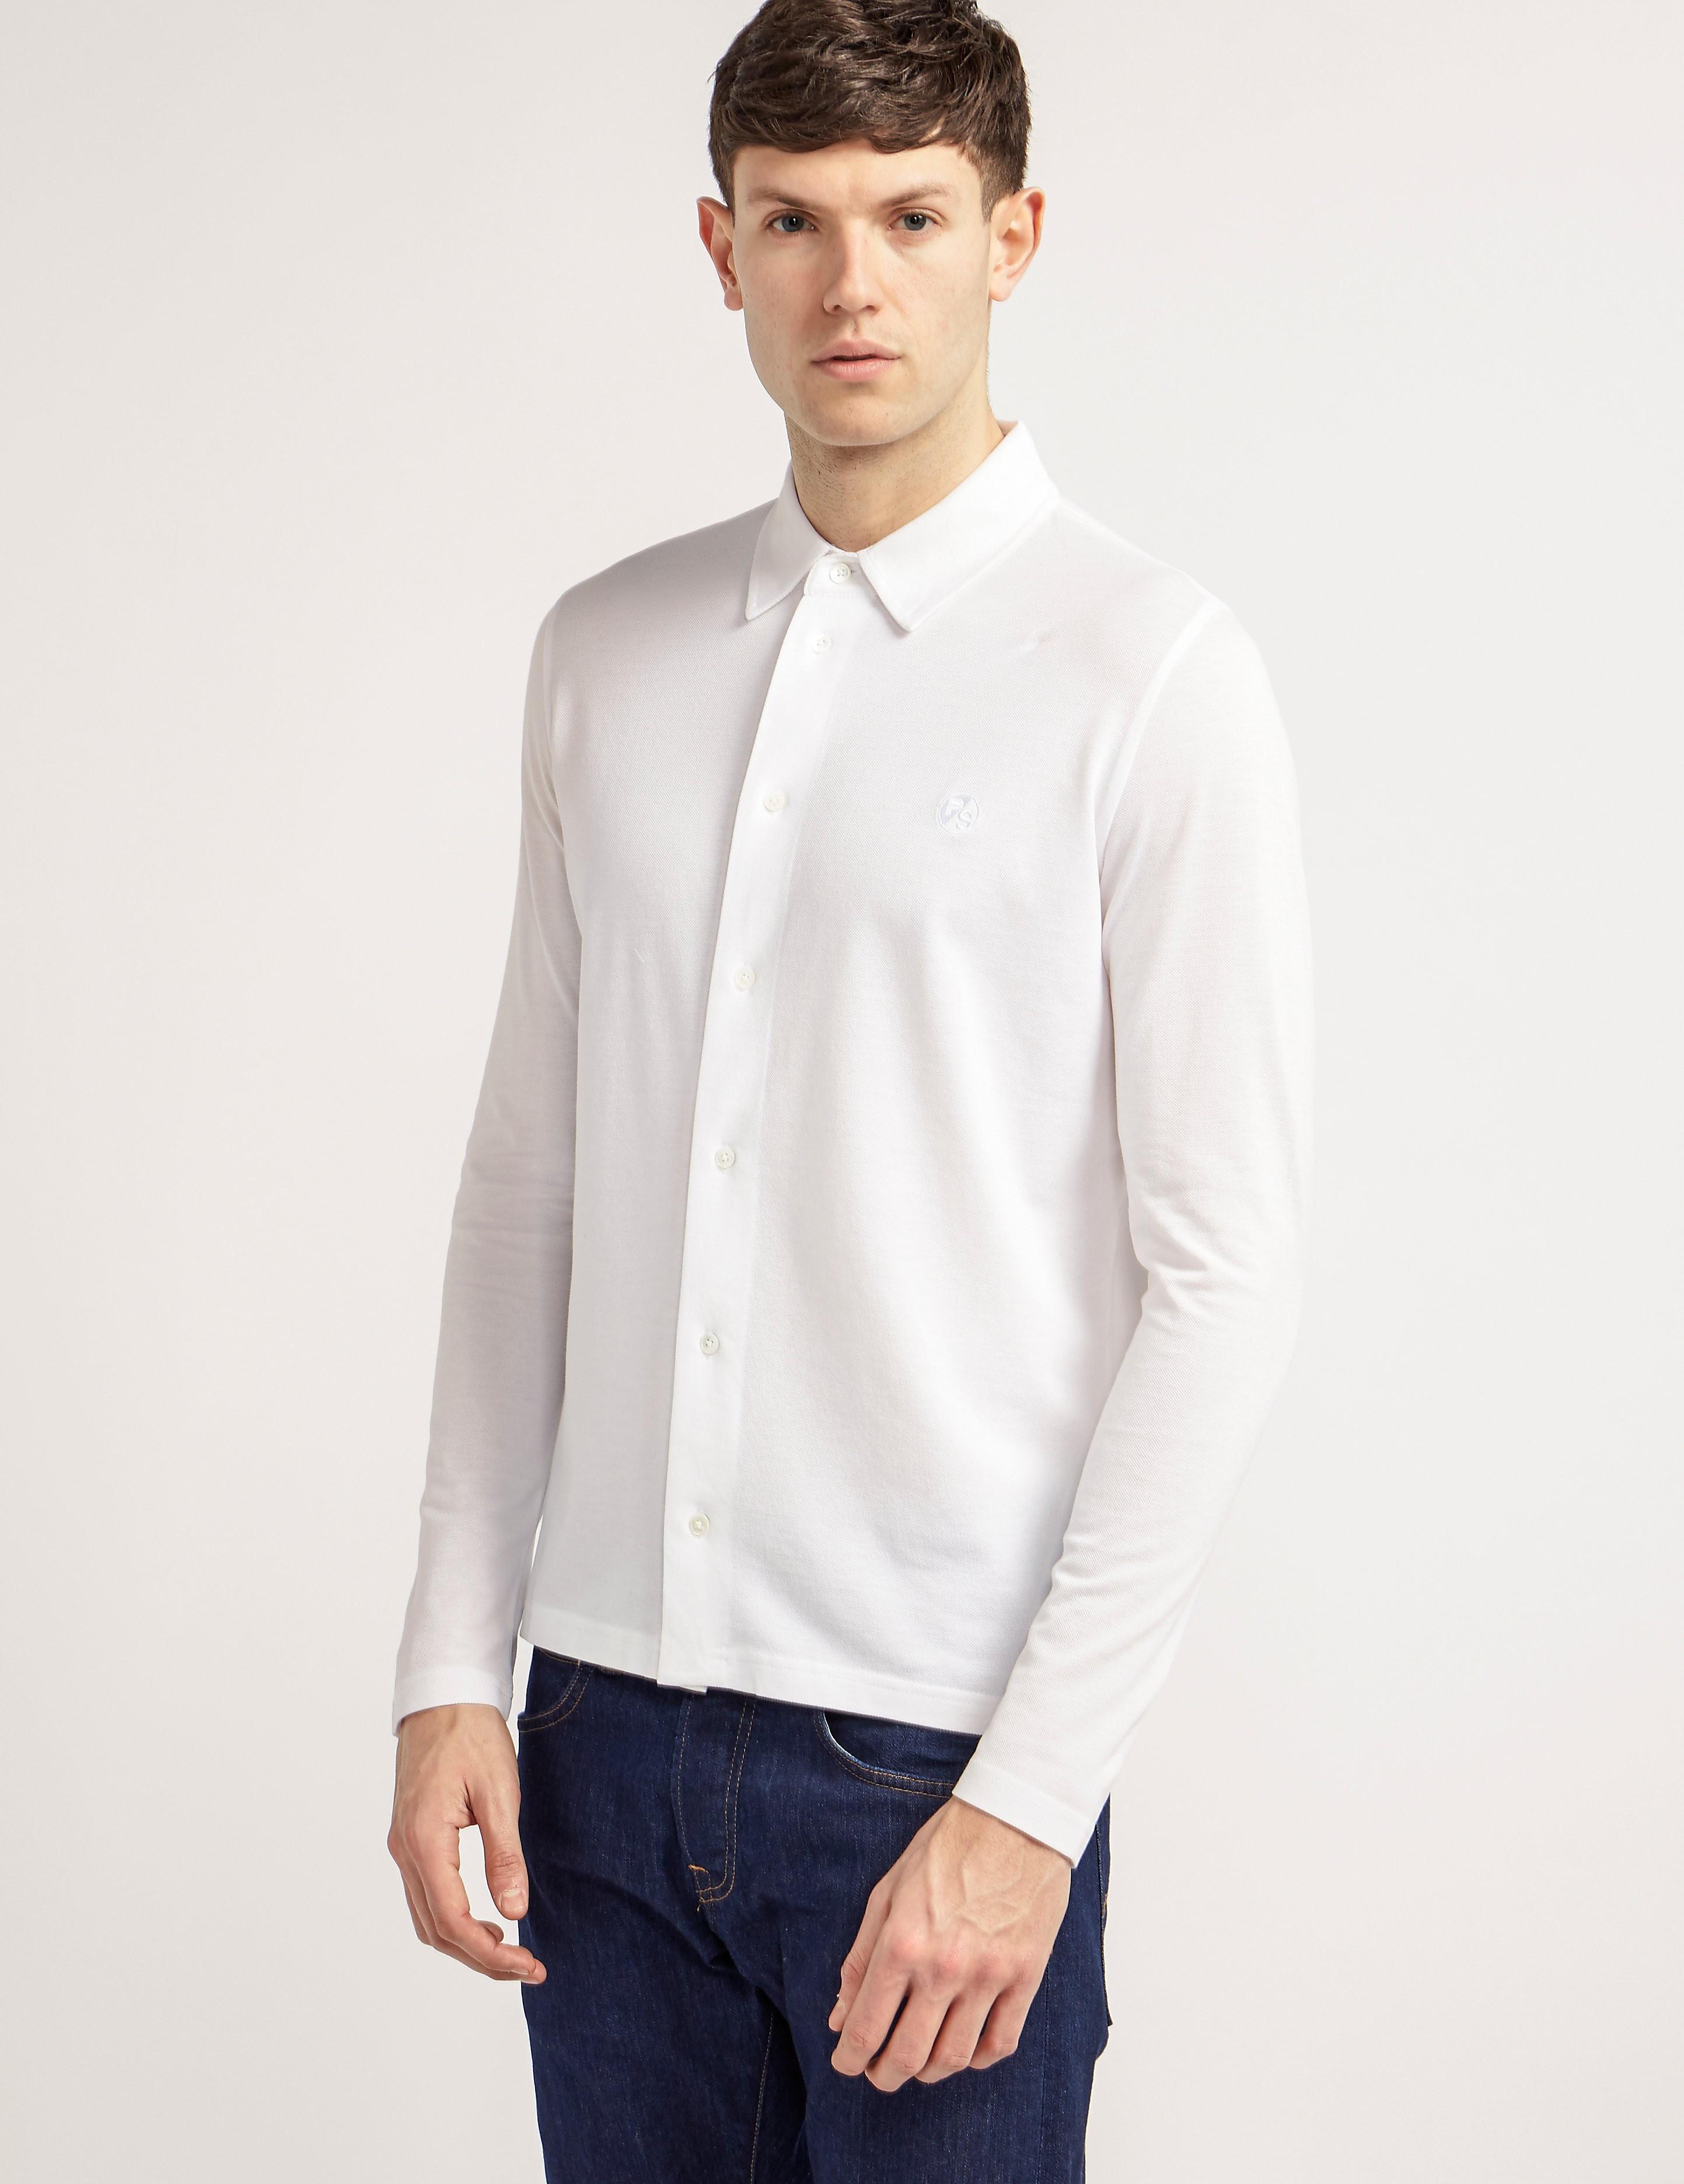 Paul Smith Pique Long Sleeve Shirt